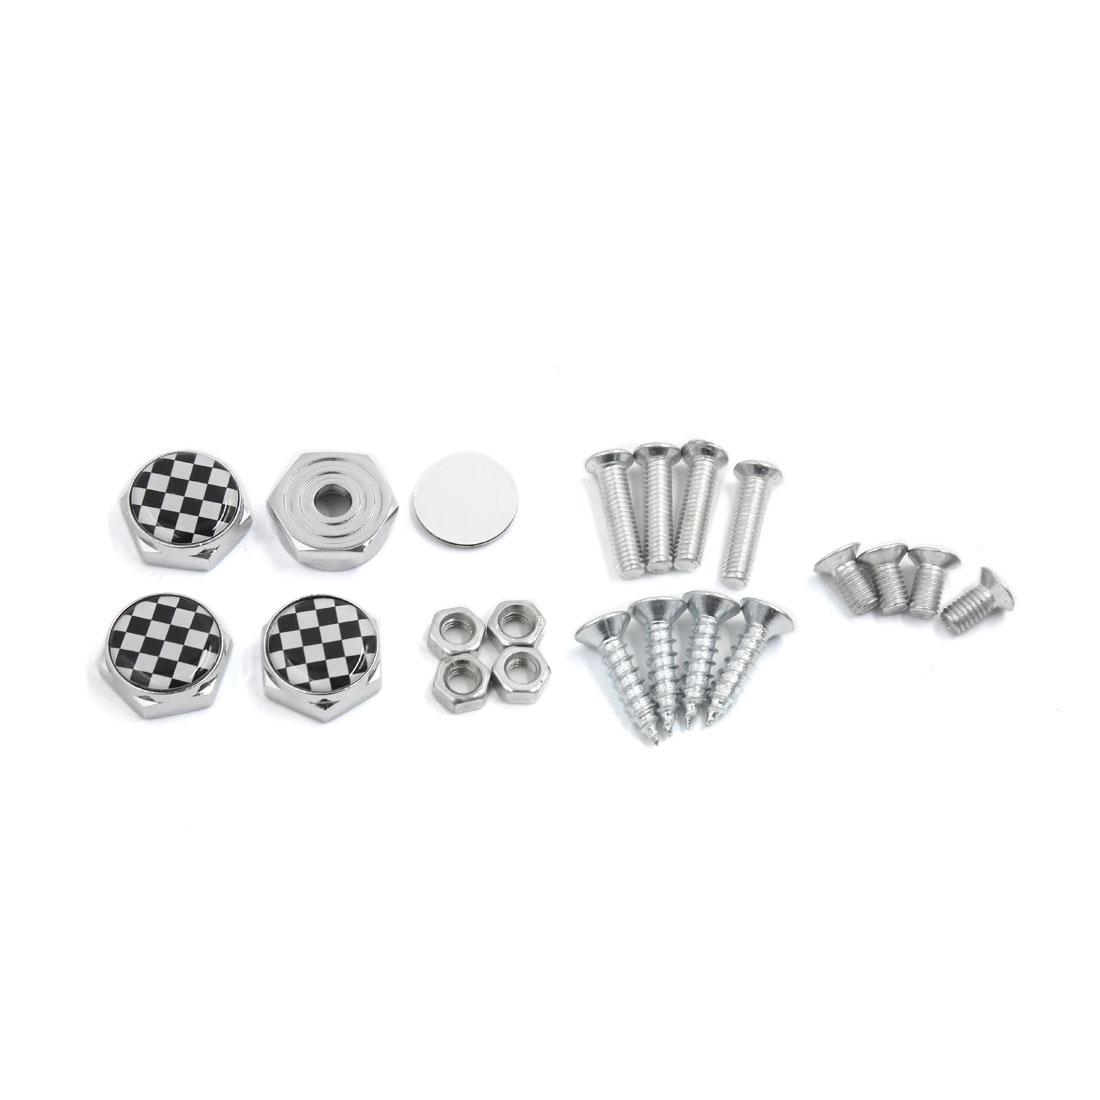 4 Pcs Metal Black White Grid Pattern Car License Plate Caps Screw Bolt